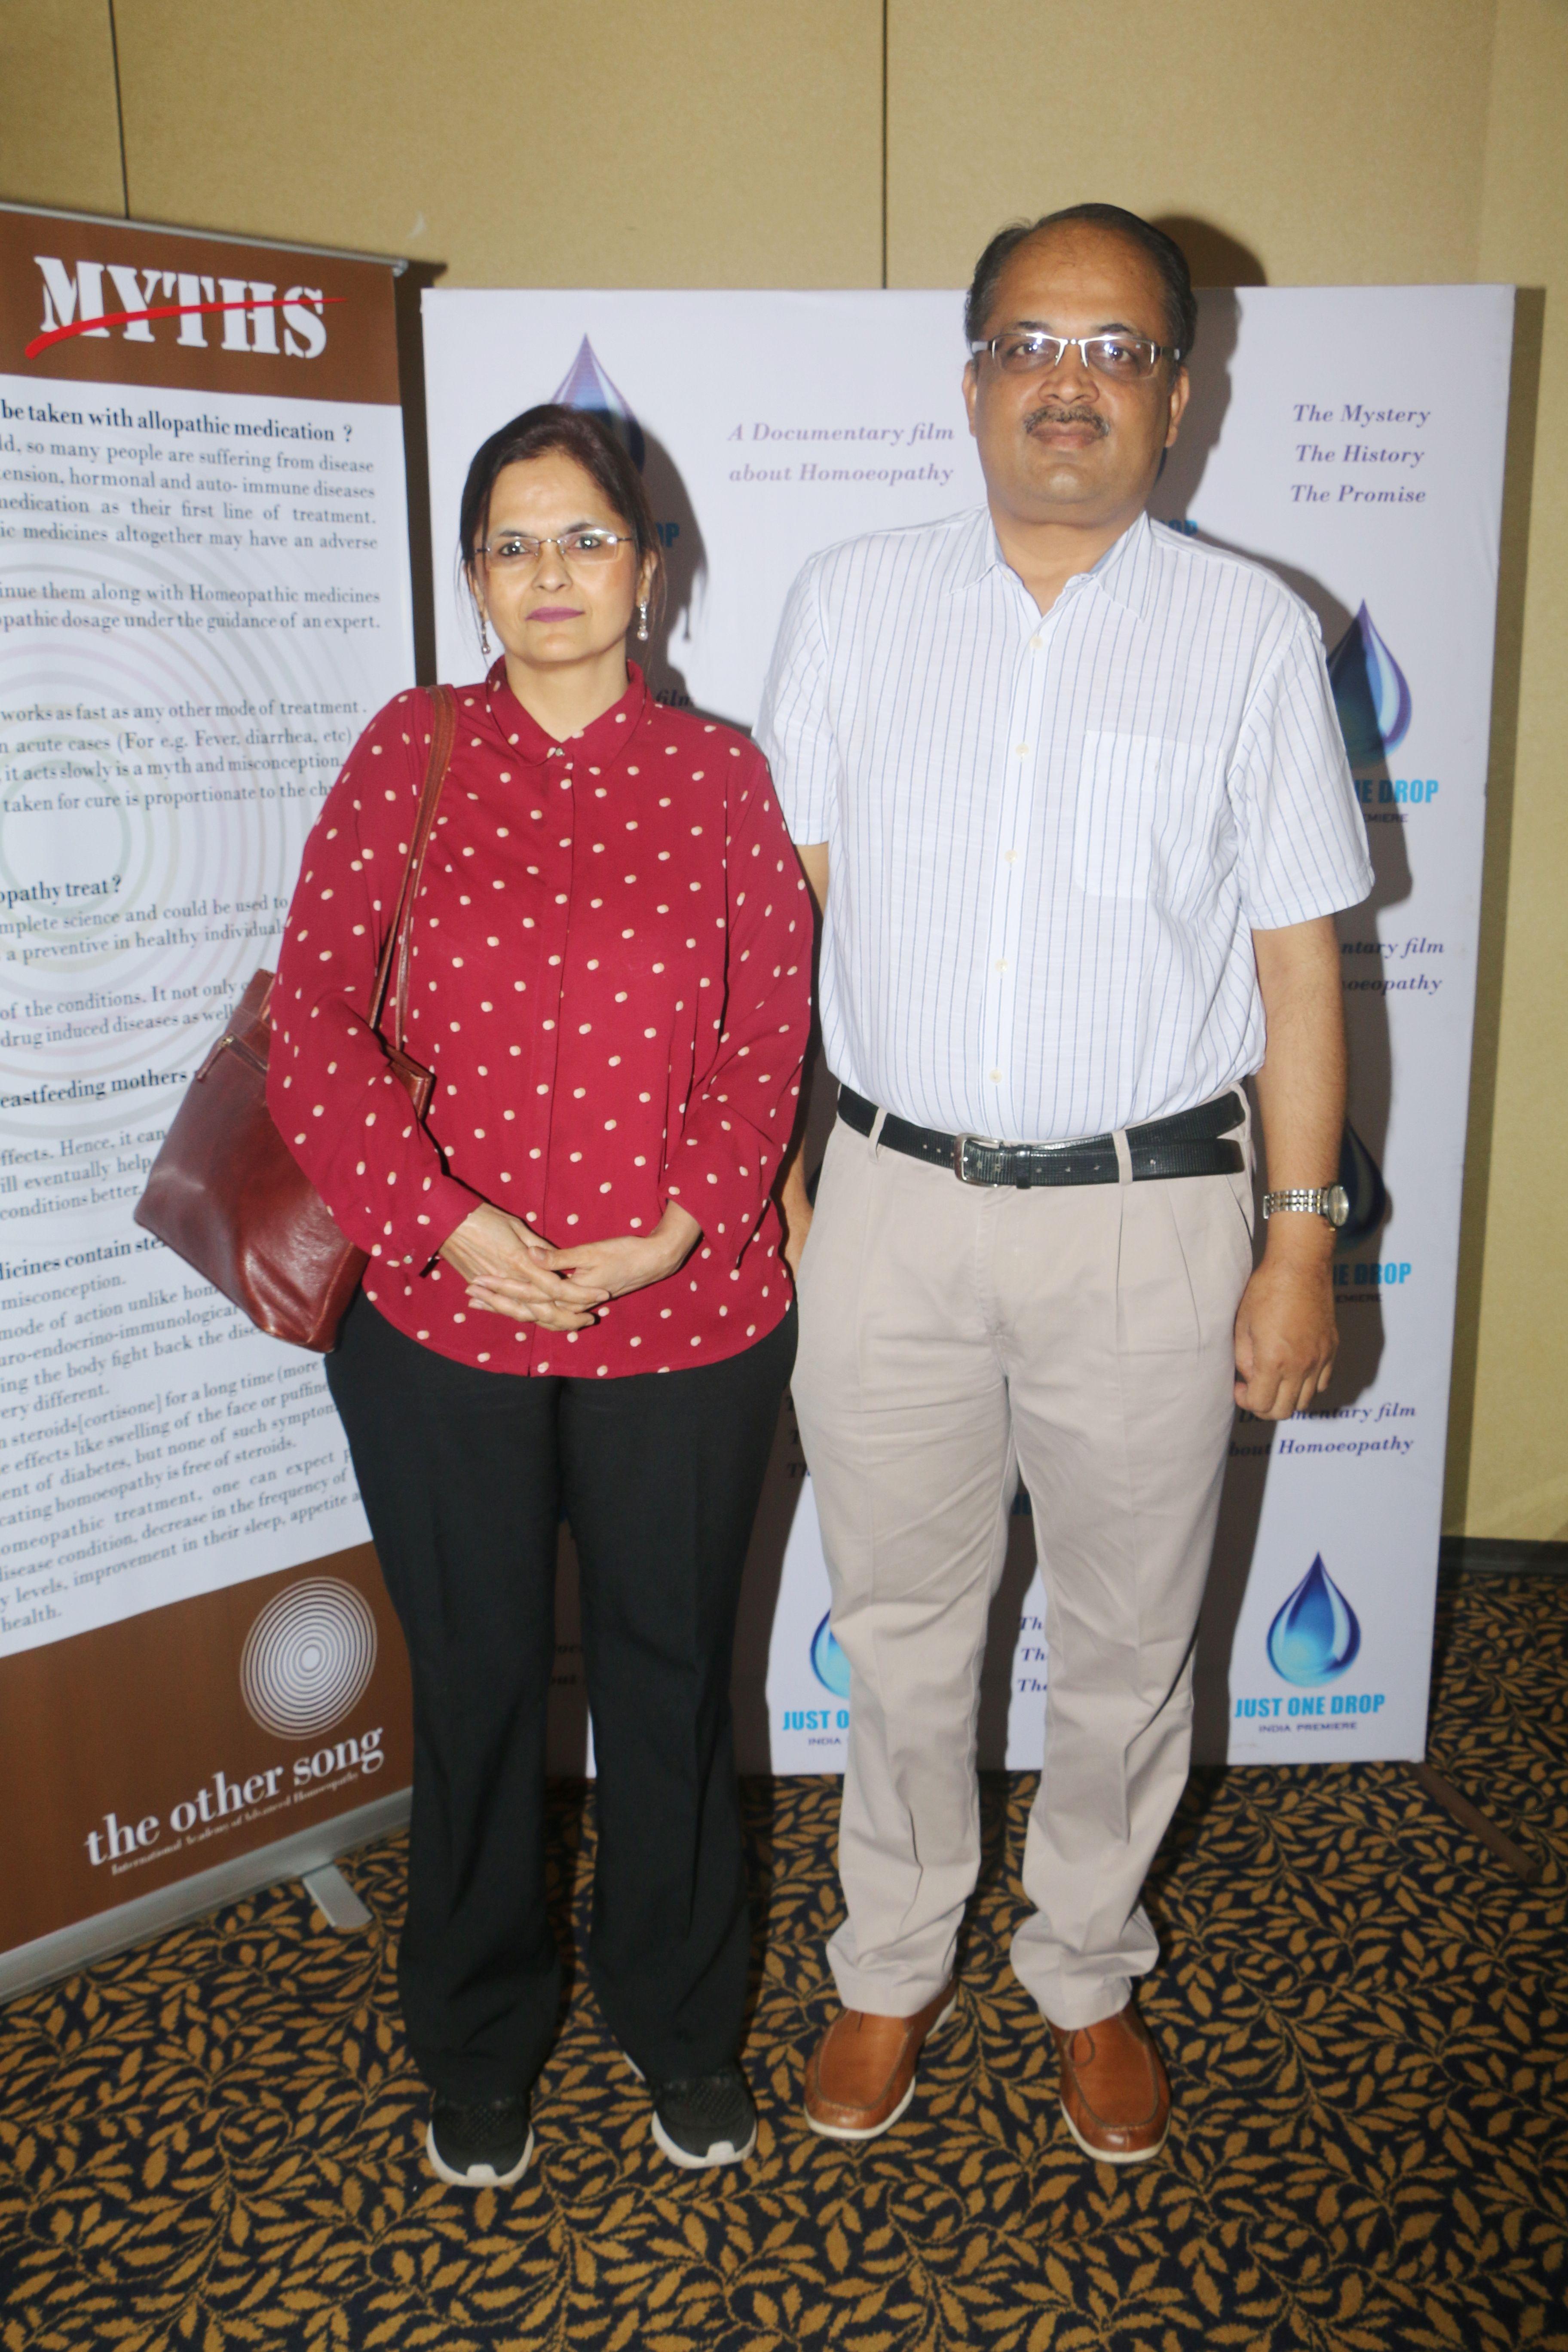 Hotel Rashmi Rashmi Deshpande Avinash Deshpande Benefitted From Homoeopathy